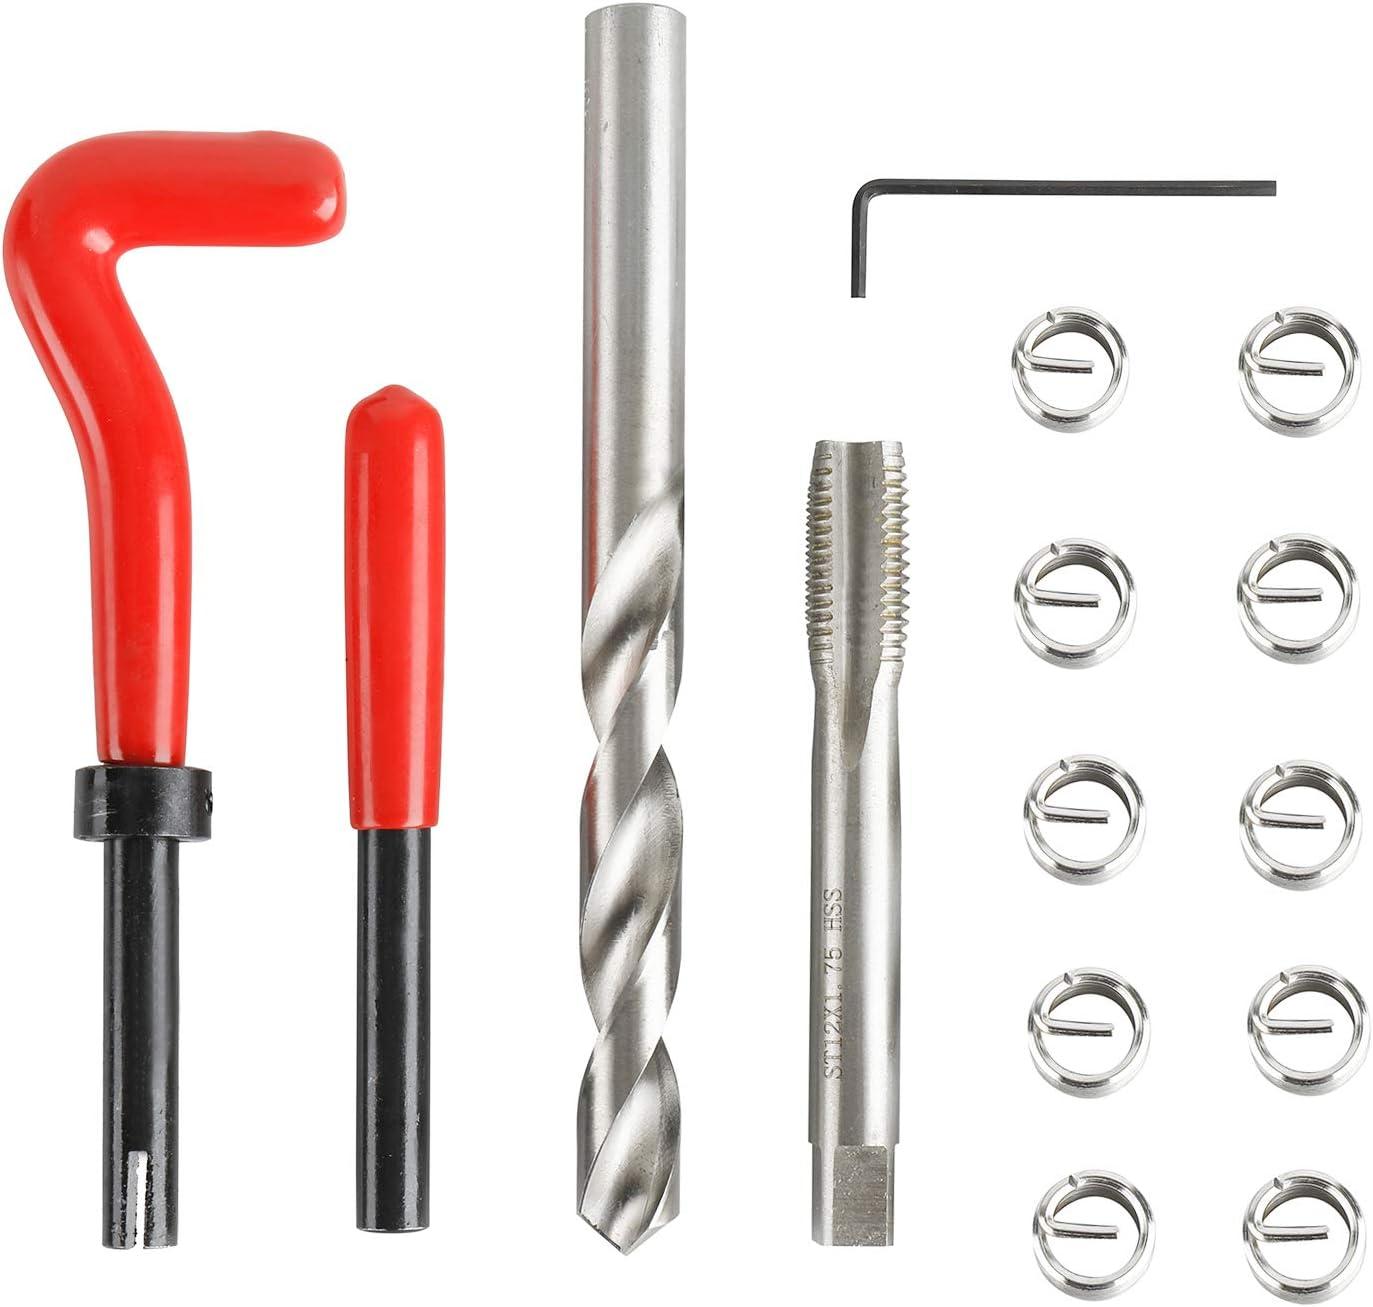 8MILELAKE 30pcs Thread Repair Kit M9 X 1.25 Thread Repair Insert Set Compatible for Auto Repairing